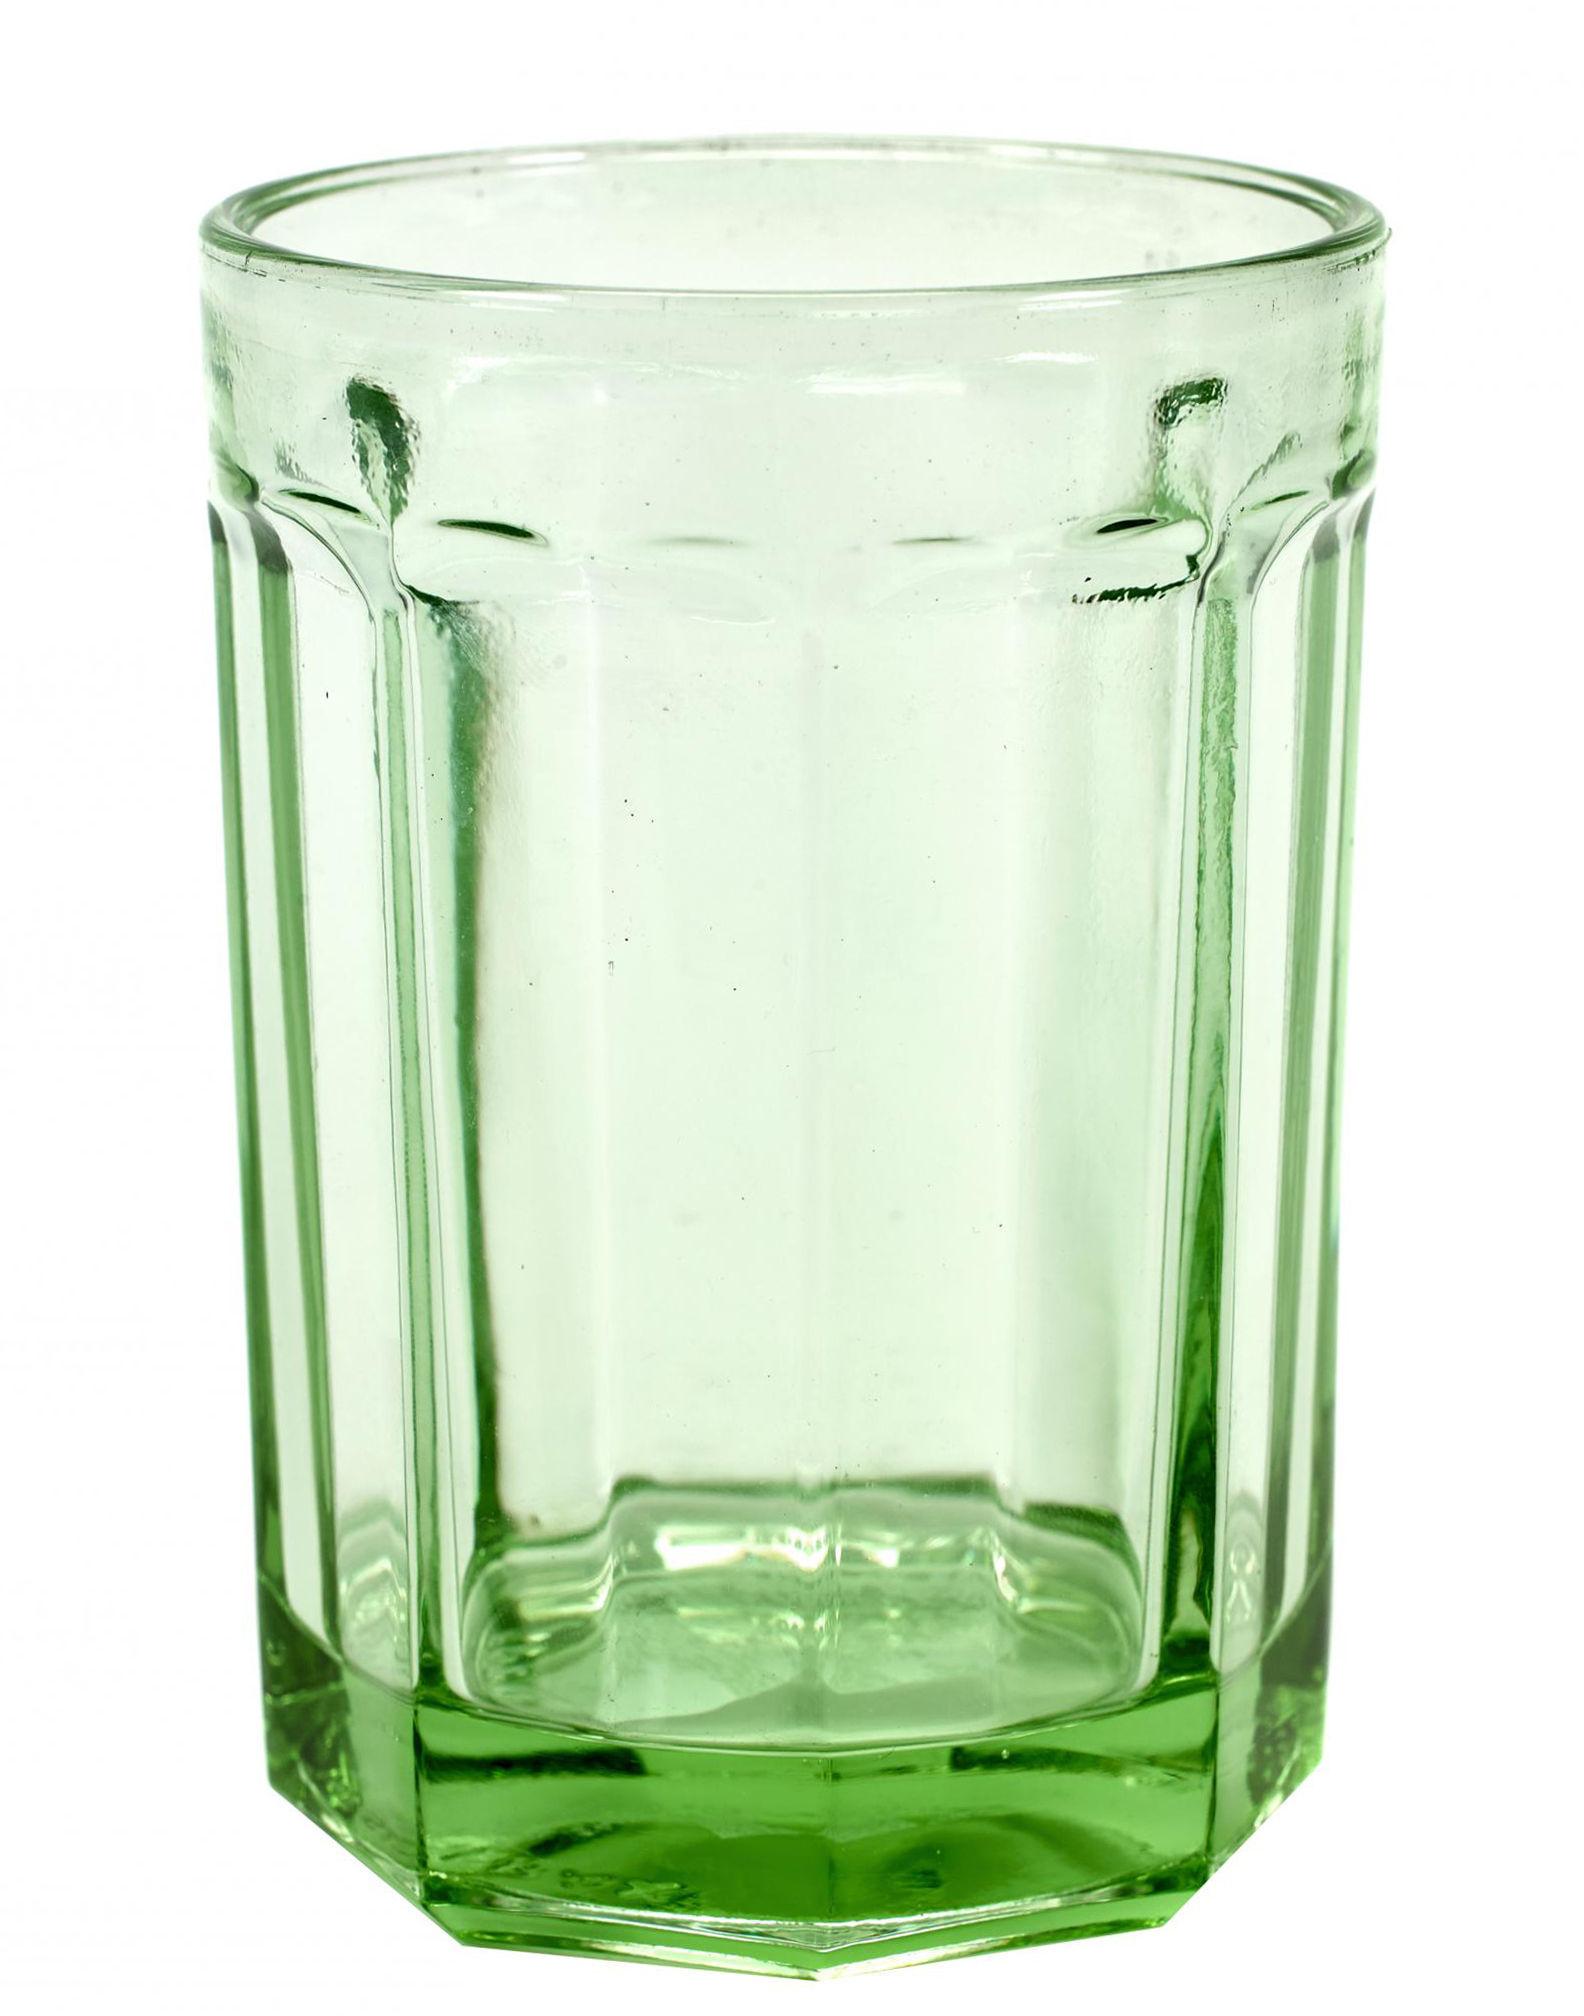 Tavola - Bicchieri  - Bicchiere Fish & Fish Large / 40 cl - Serax - Verde giada - Vetro pressato